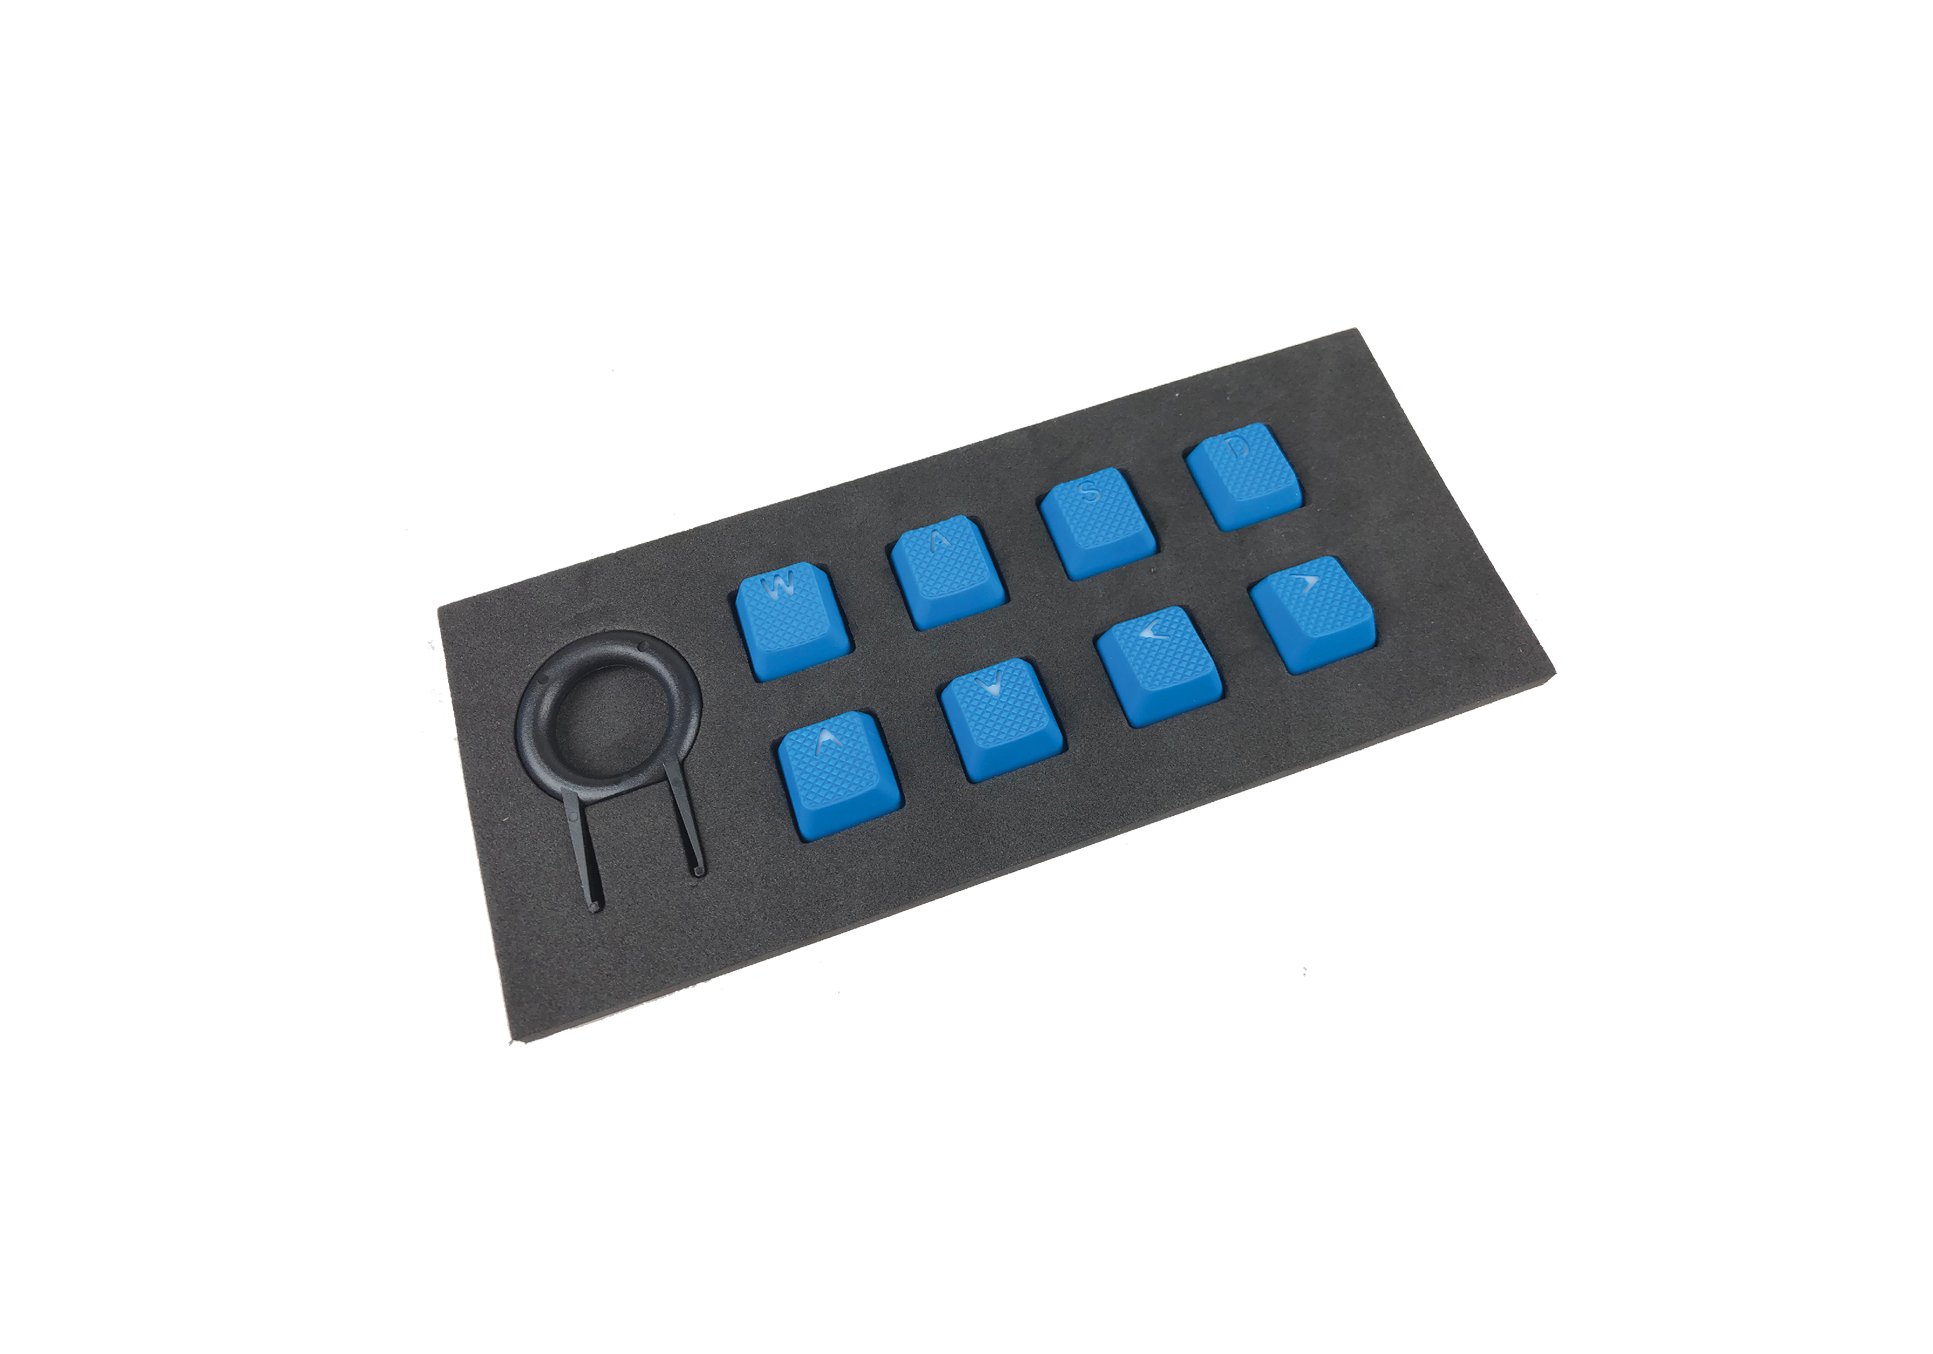 Textured Keycaps